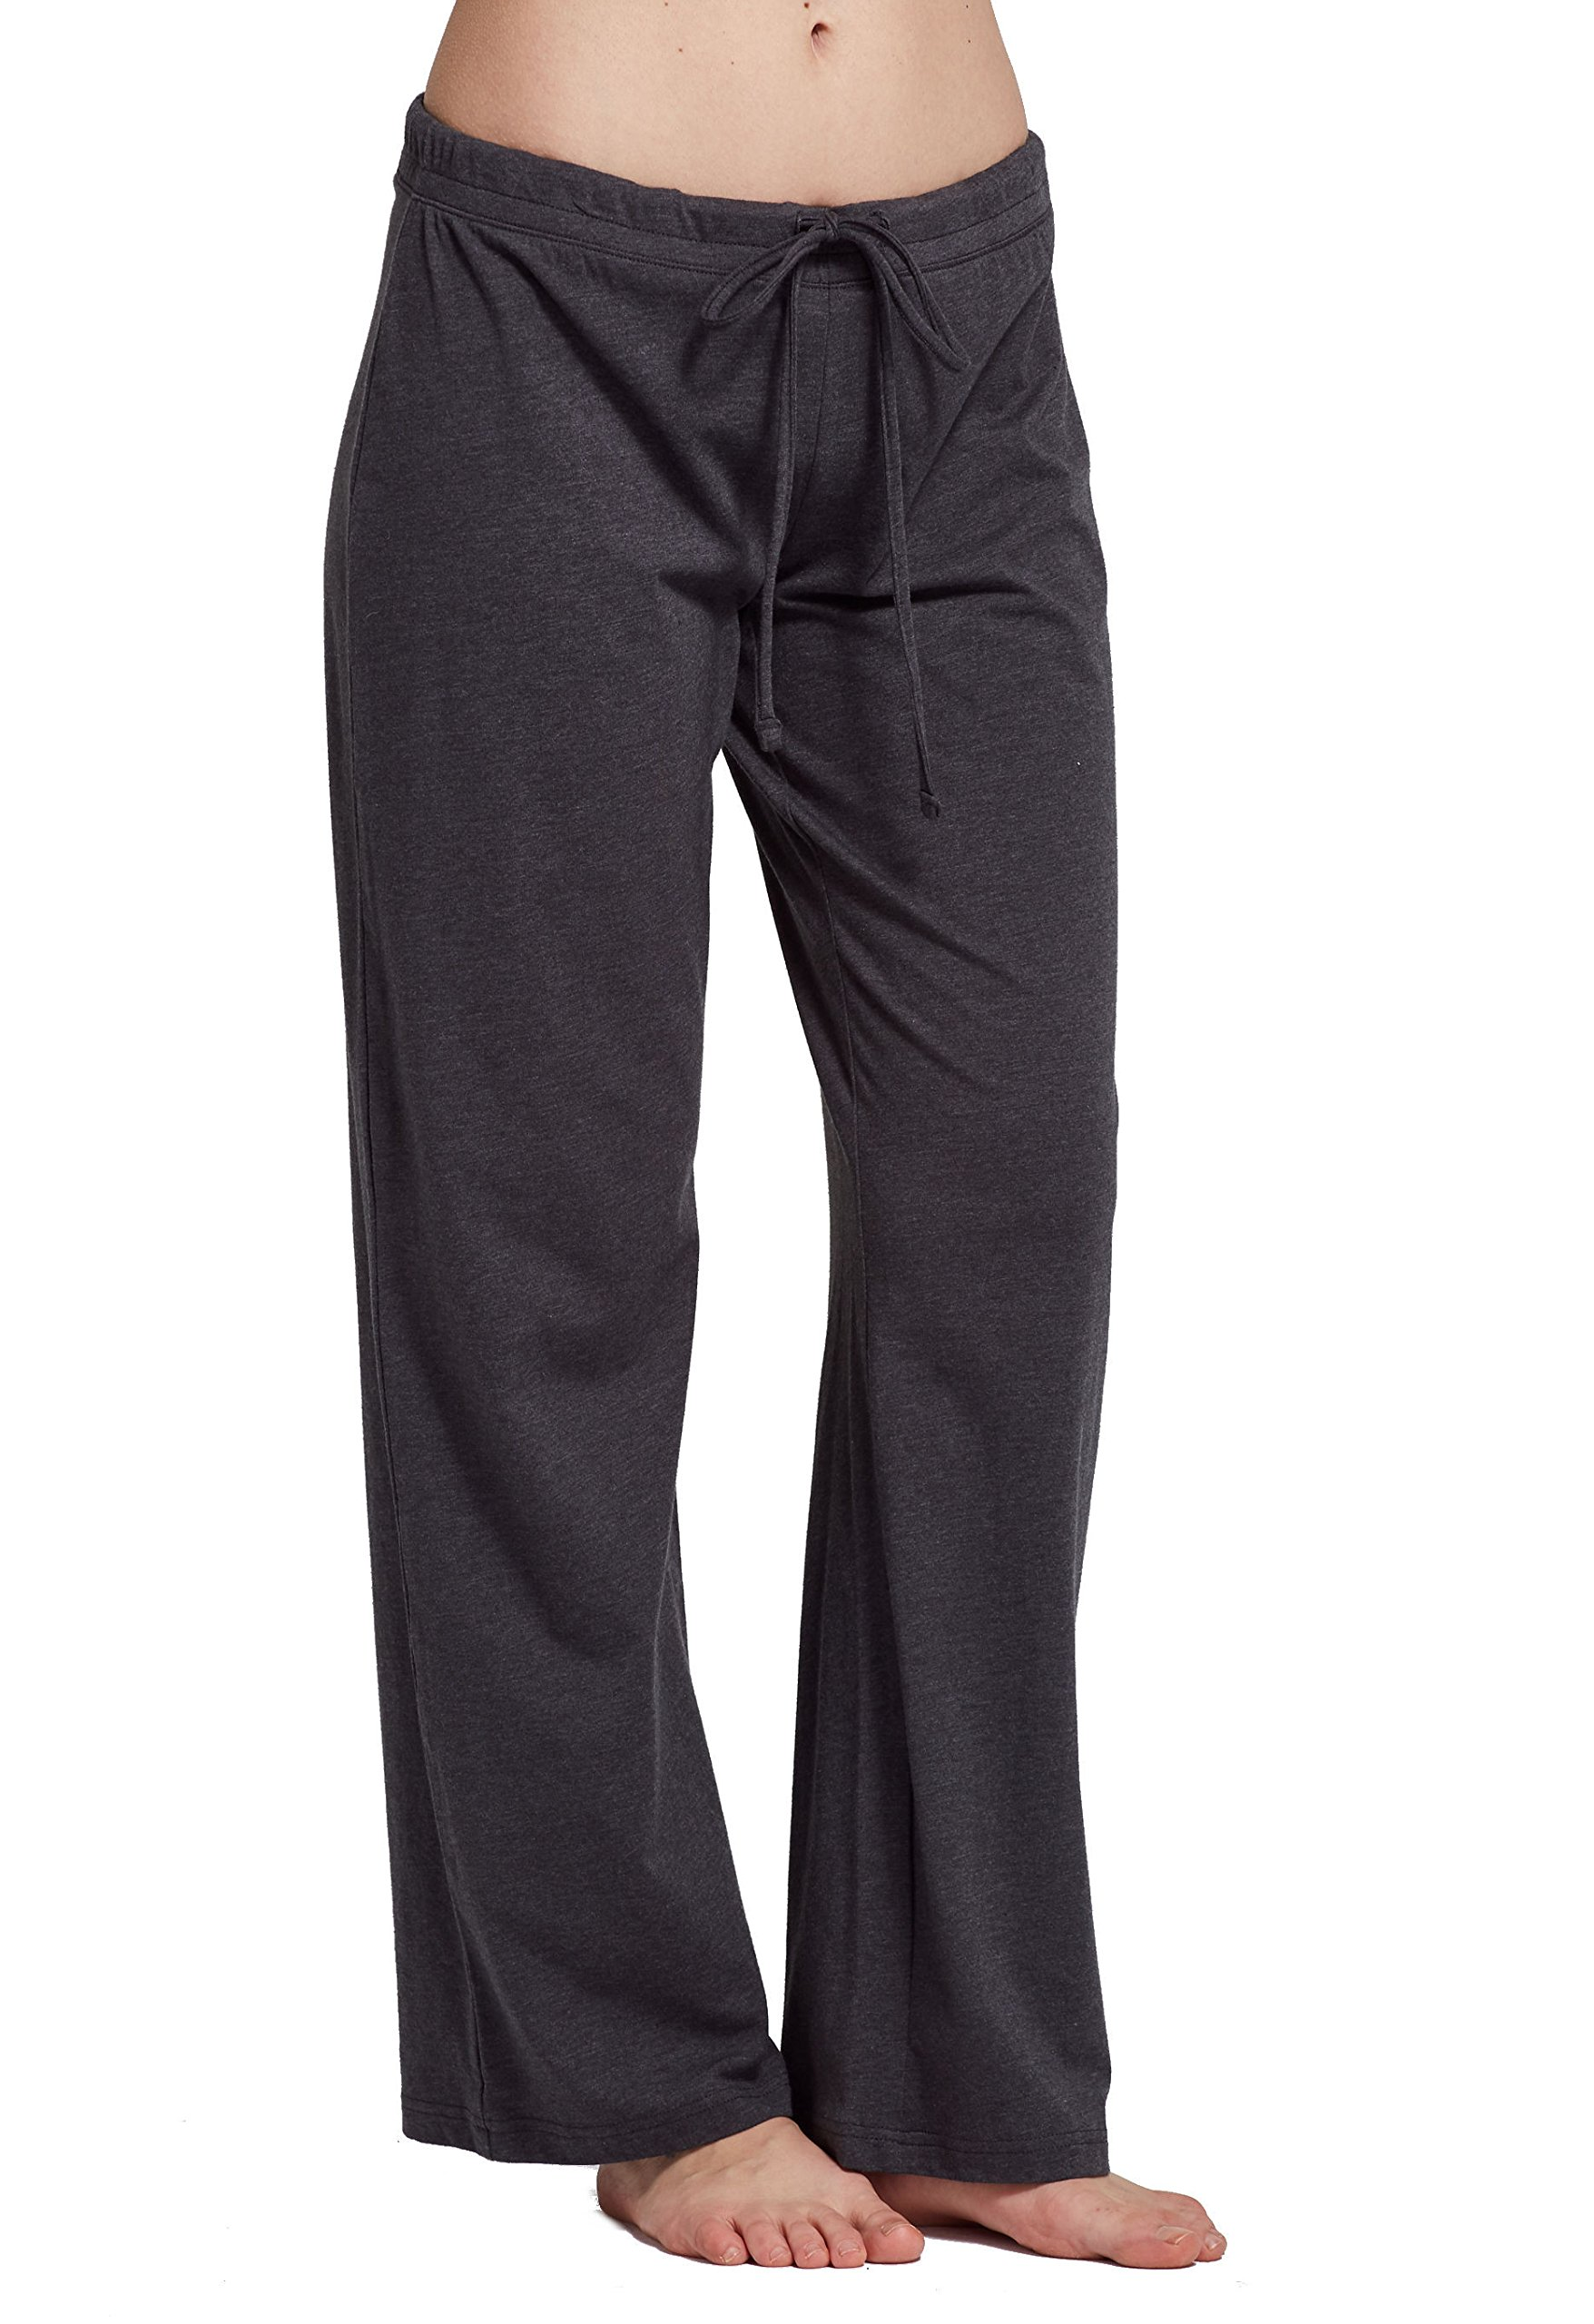 CYZ Women's Basic Stretch Cotton Knit Pajama Sleep Lounge Pants-Charcoal-L